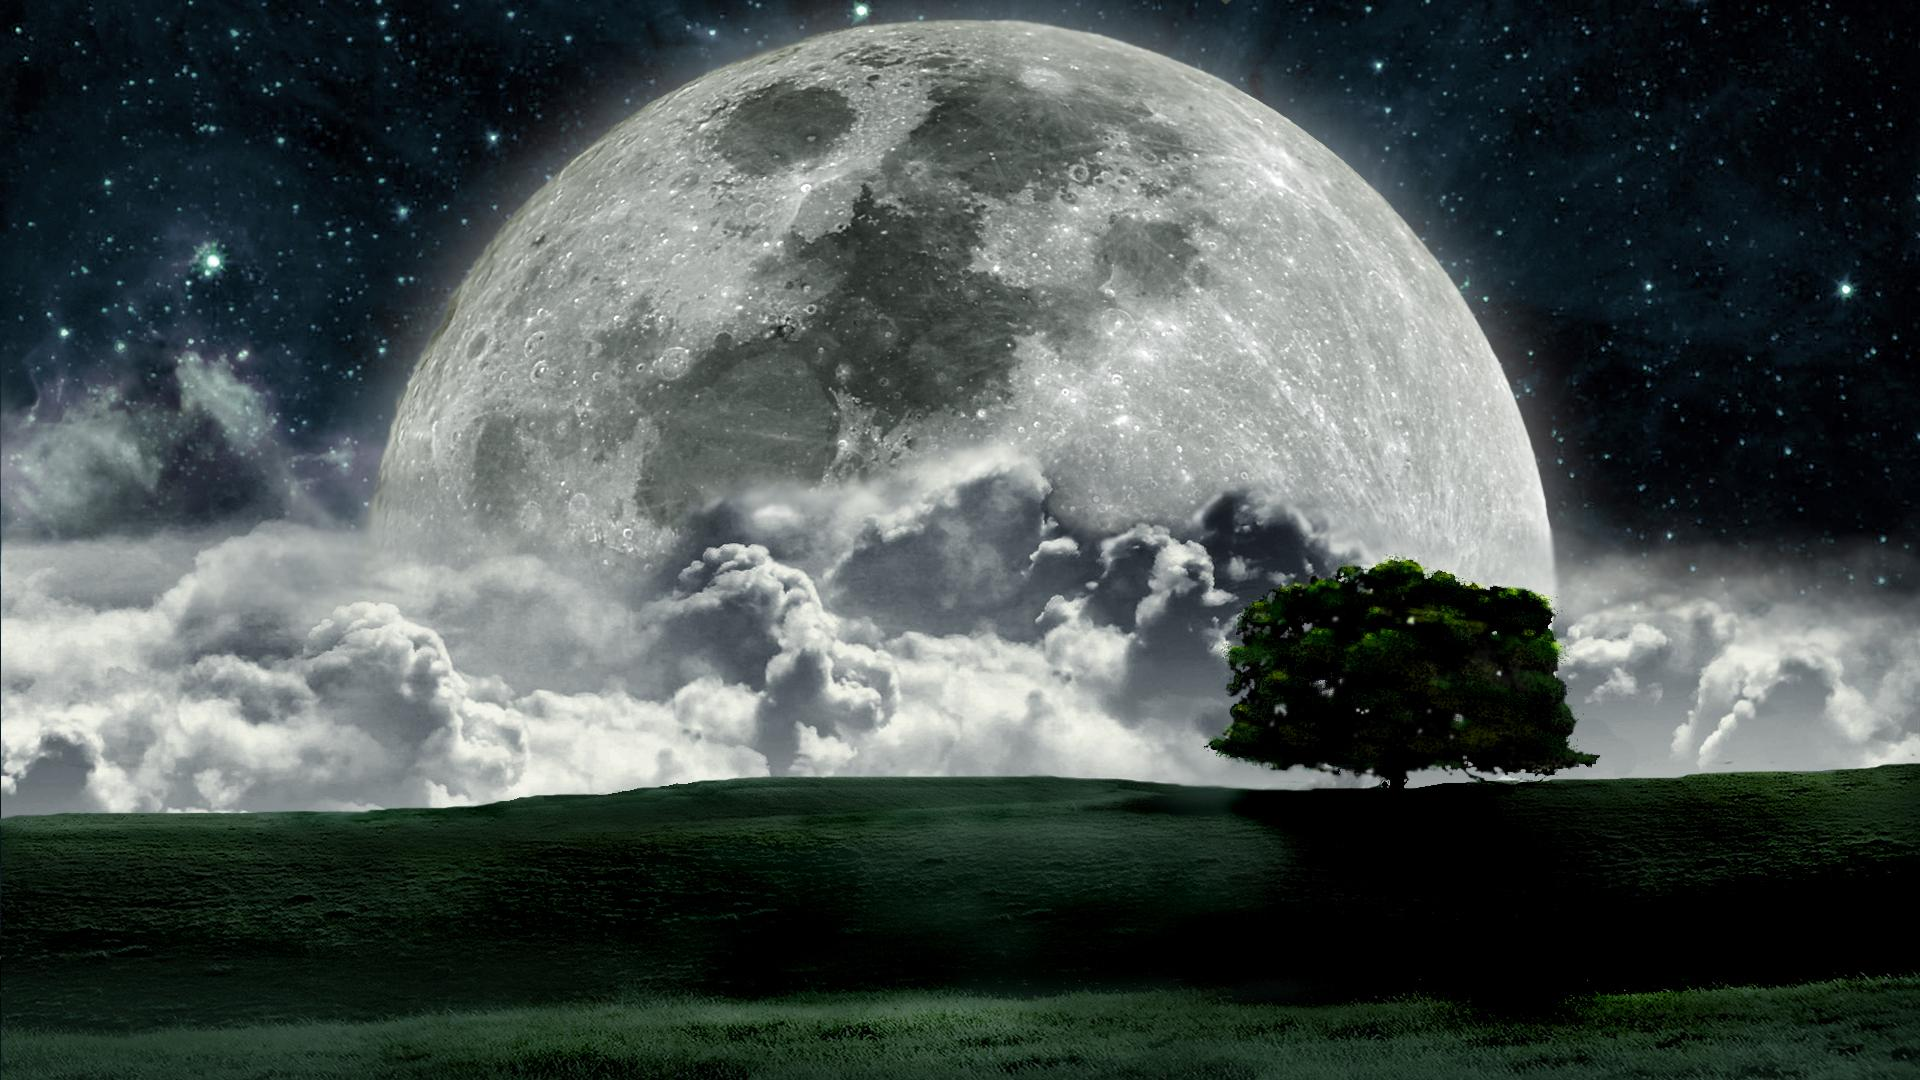 moon night abstract image